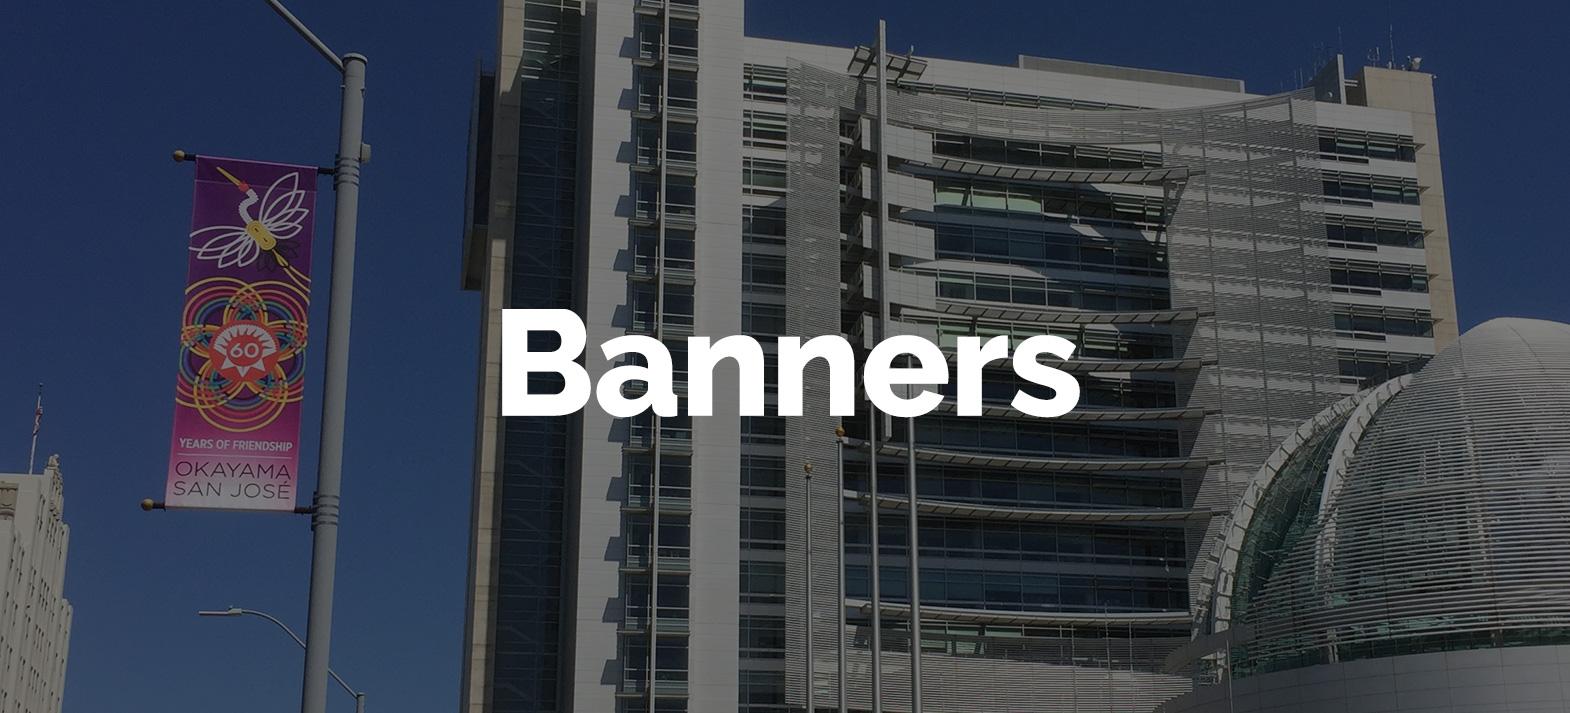 banners-cs.jpg